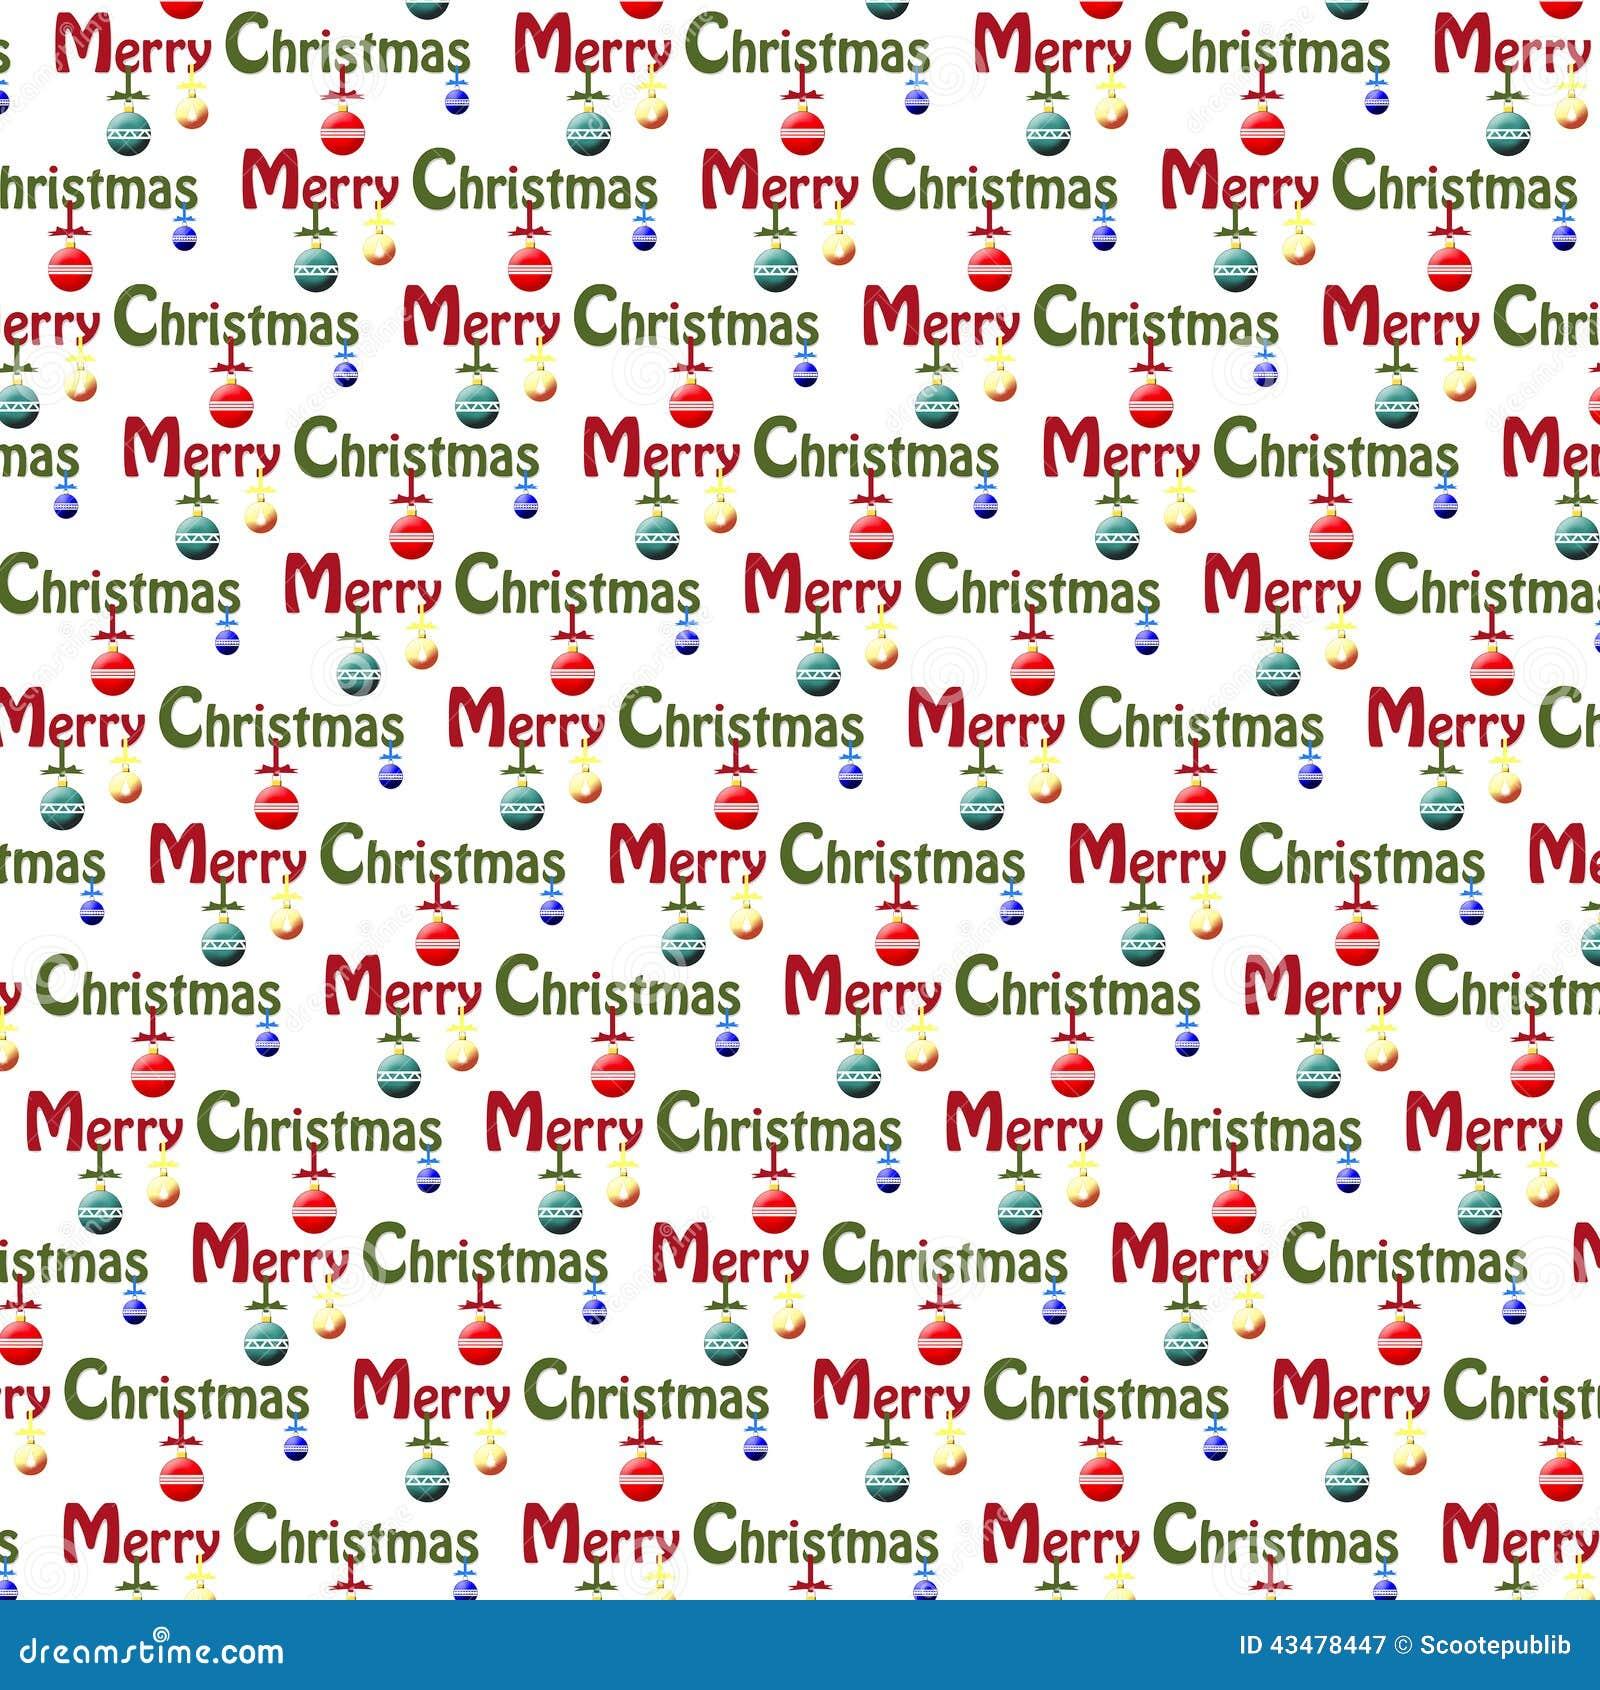 Pin by Mary Kyanda on Christmas | Pinterest